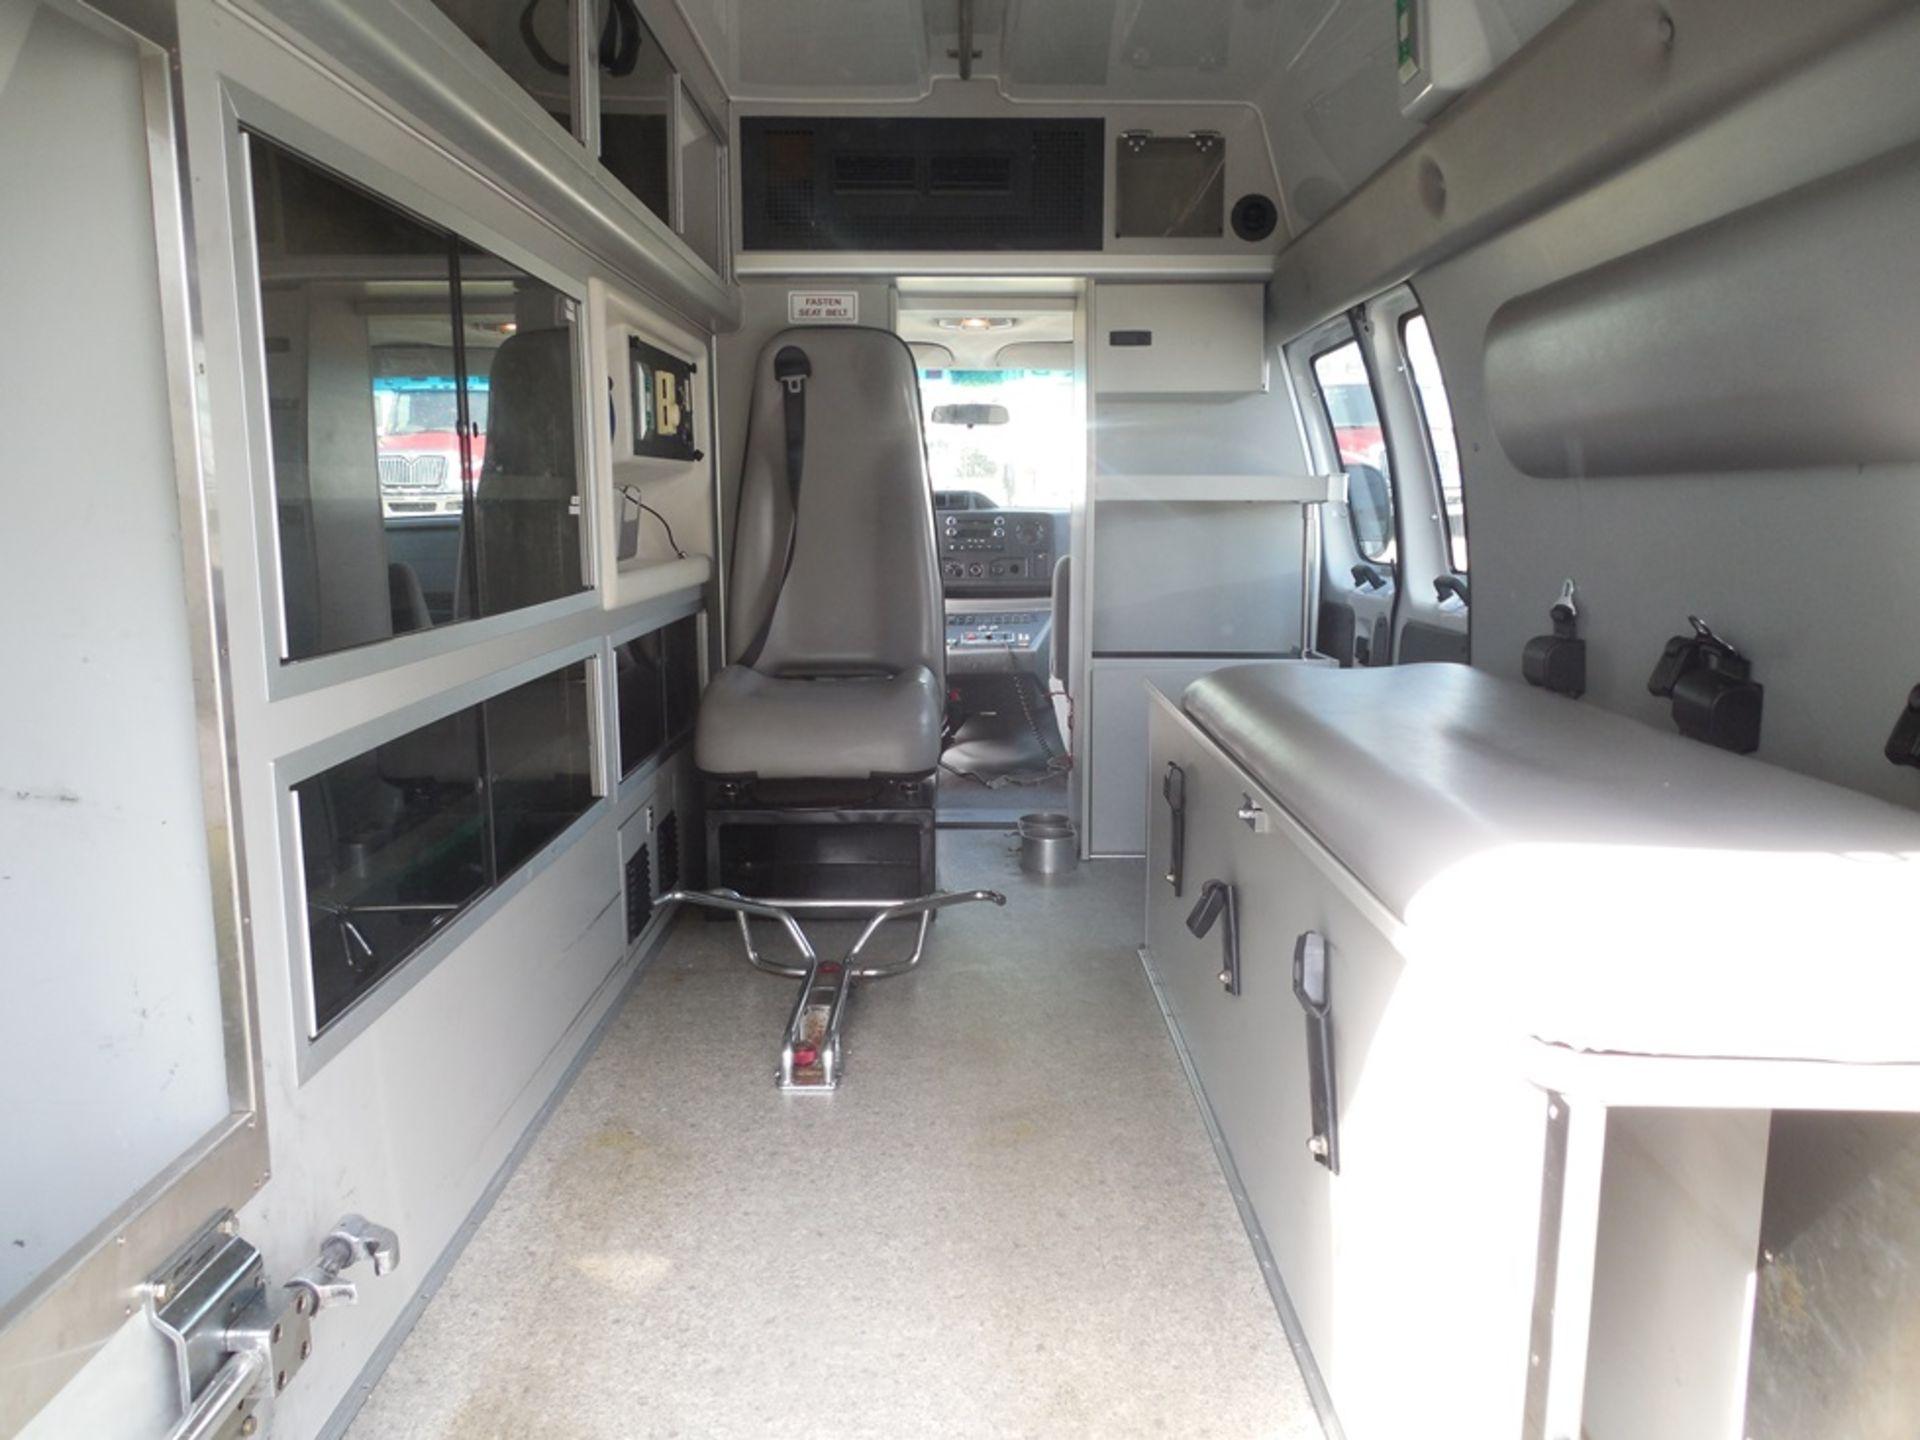 2010 Ford E350 Crusader Wheel Coach van ambulance 214,465 miles vin# 1FDSS3EP9ADA32493 - Image 6 of 6